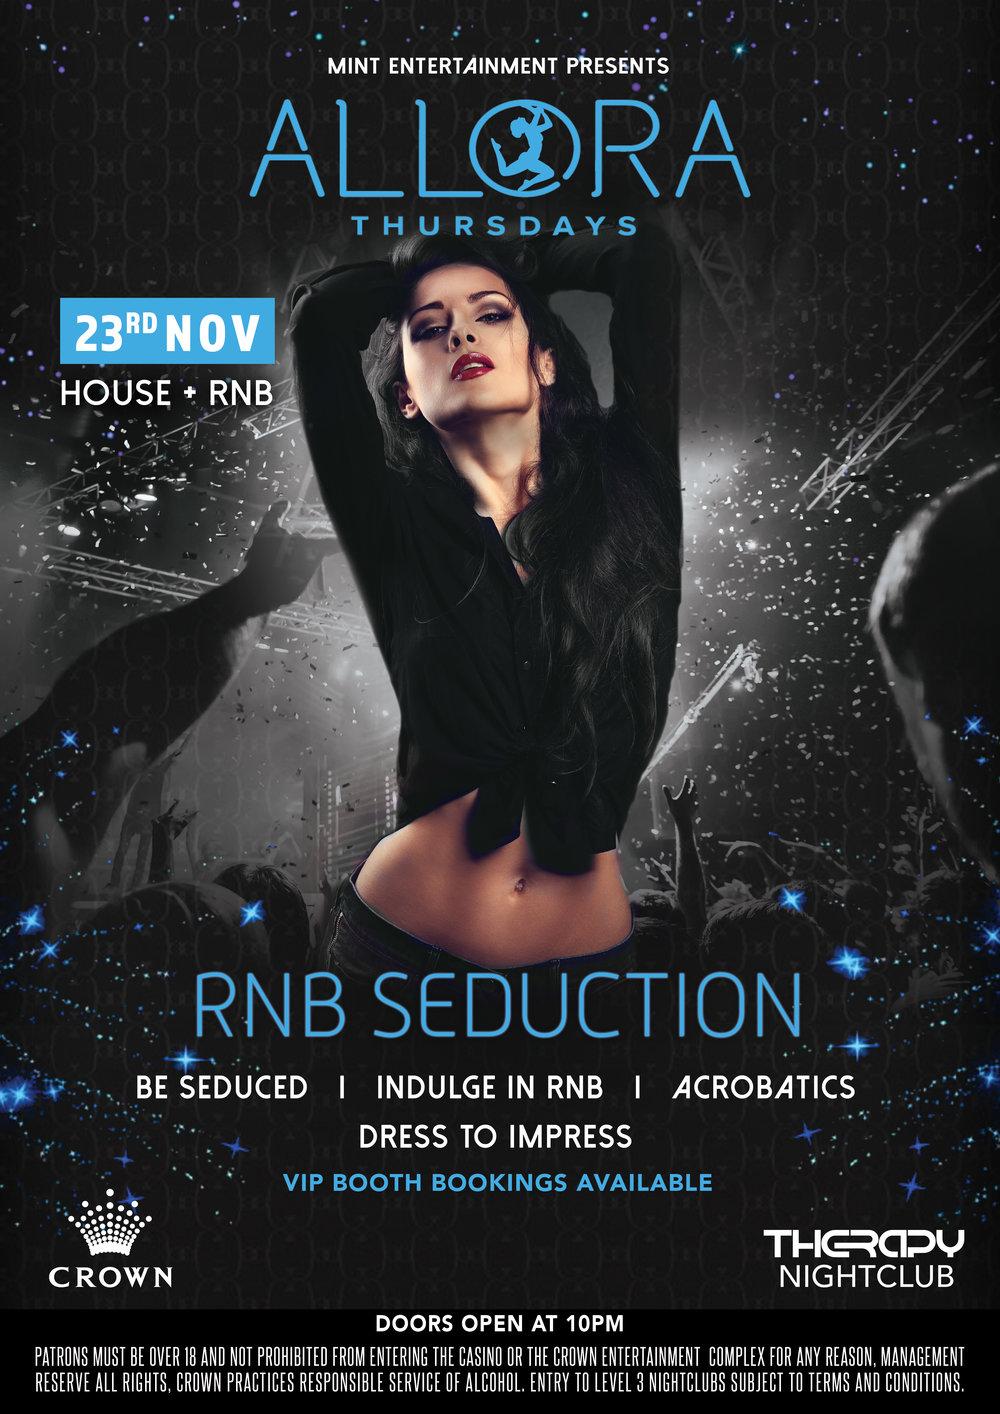 171123-Crown-Melbourne-Nightclubs-Therapy-Allora-RnbSeduction-FacebookFlyer.jpg